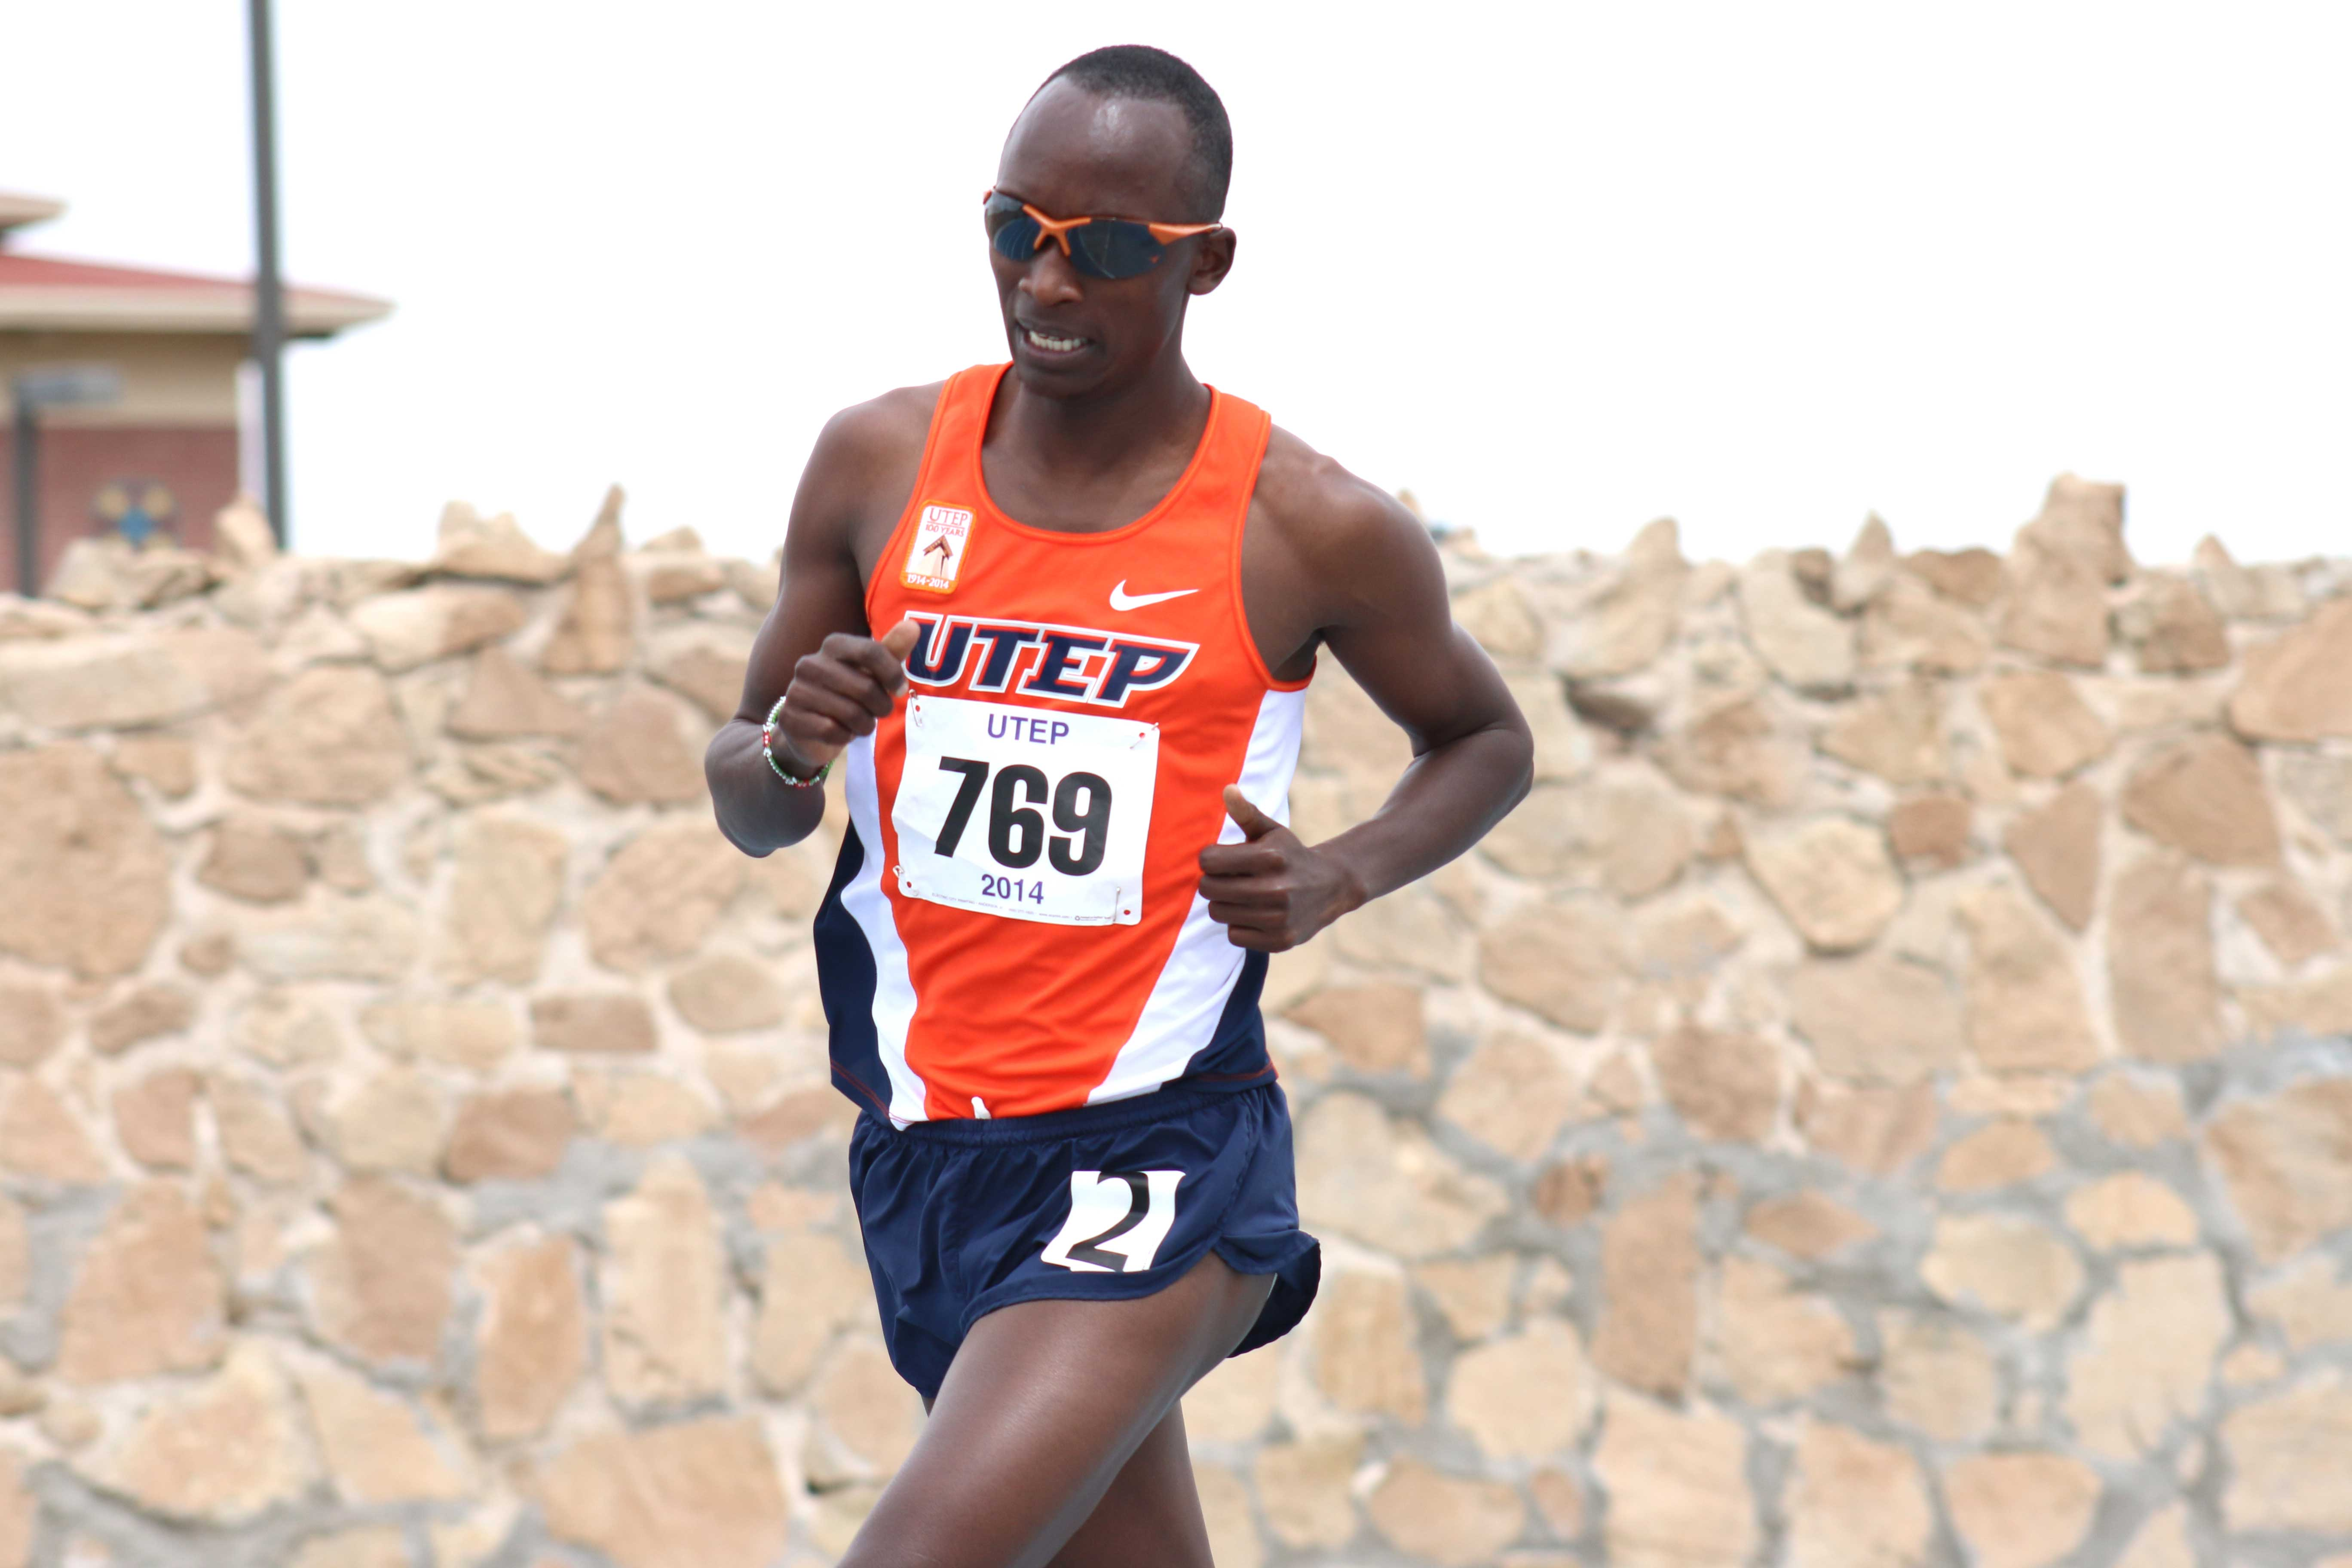 Freshman distance runner Cosmas Boit, along Anthony Rotich, Abiola Onakoya and Daniel Tarango, earned gold in the distance medley relay.